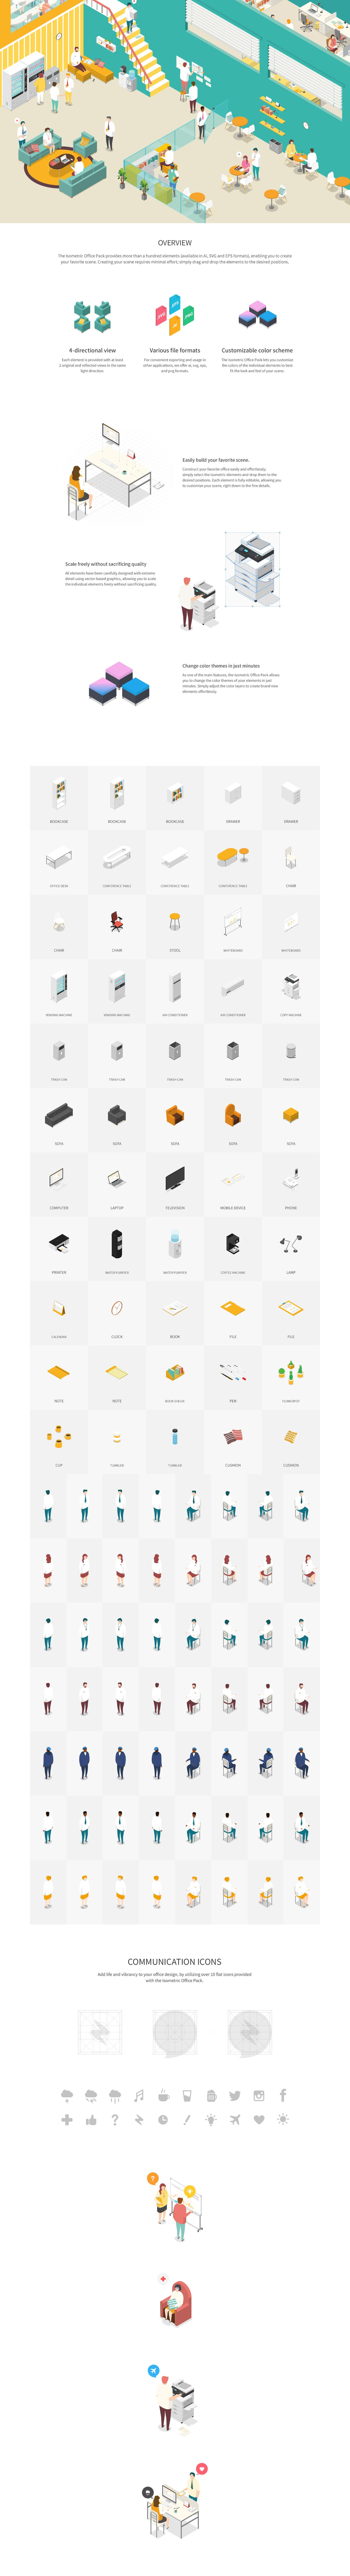 Isometric illustrations Office communication Electronics furniture people